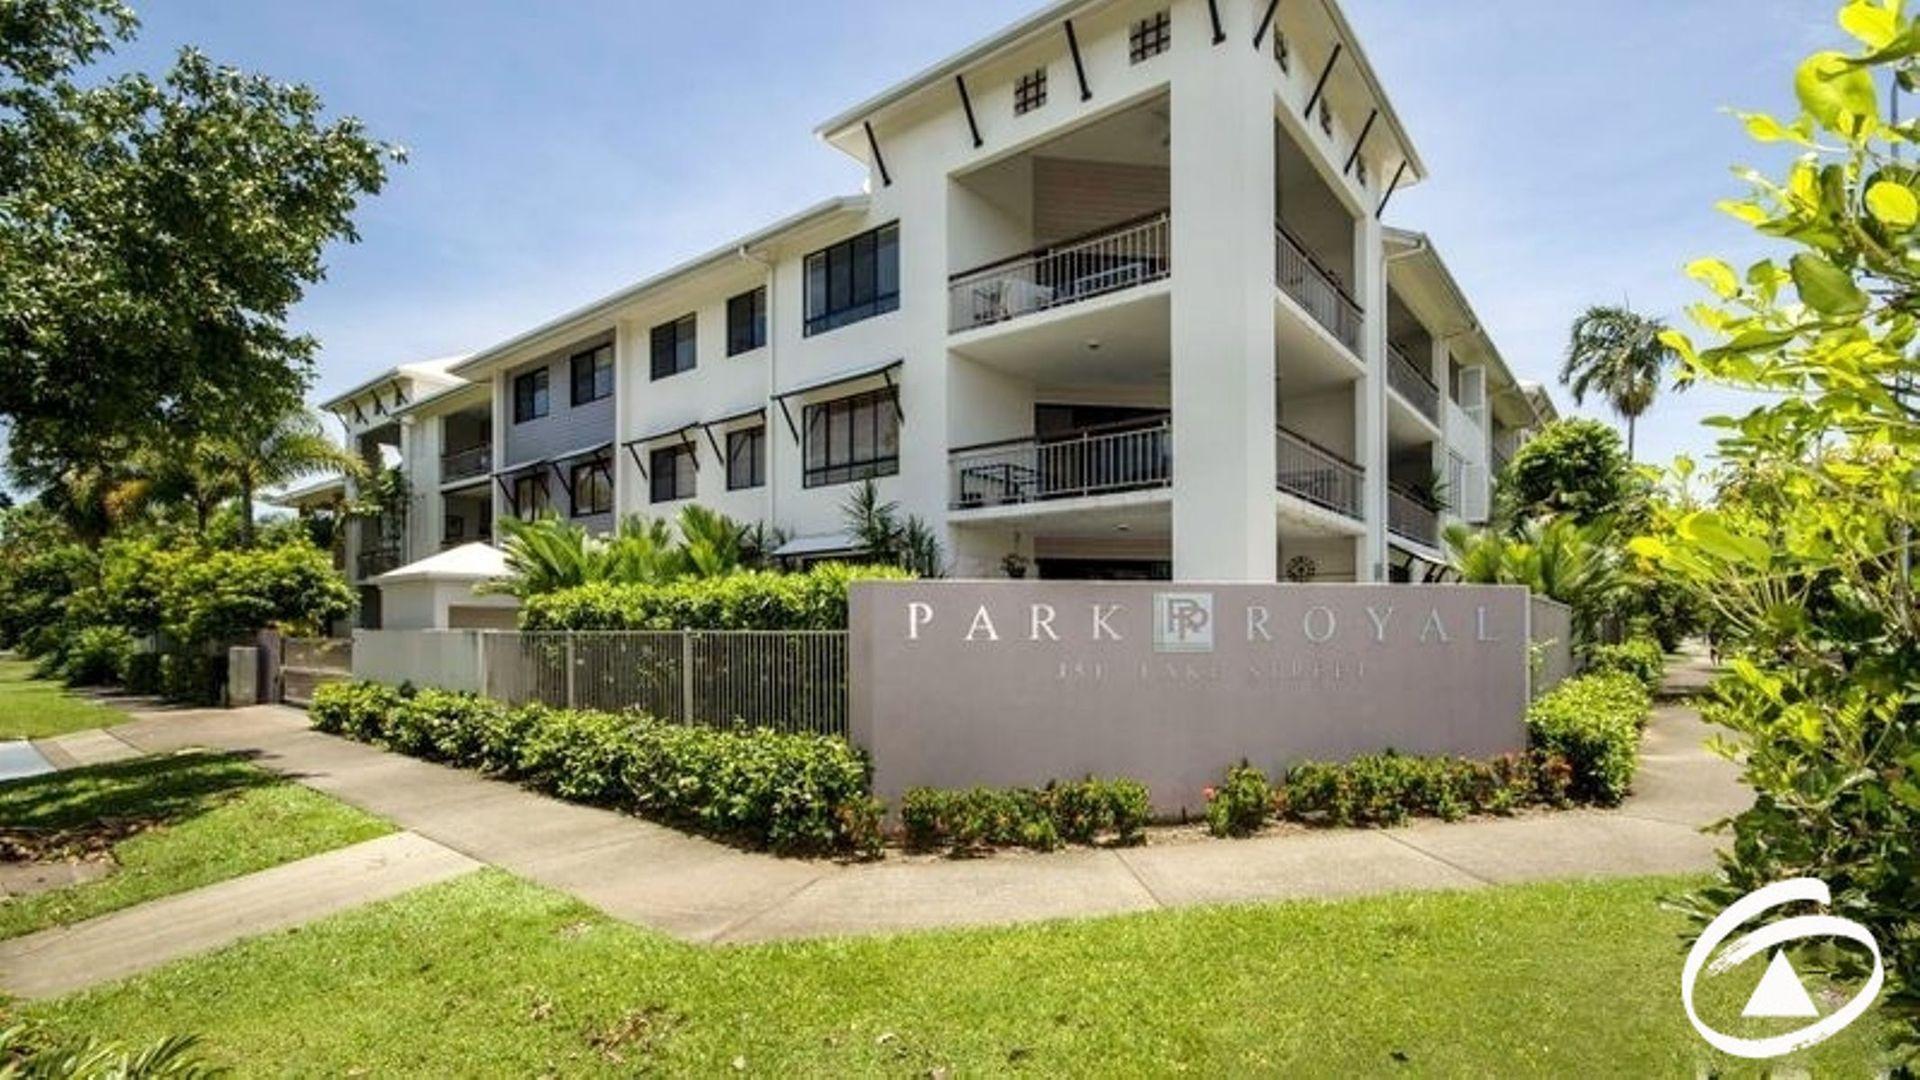 6/351 Lake Street, Cairns North QLD 4870, Image 0